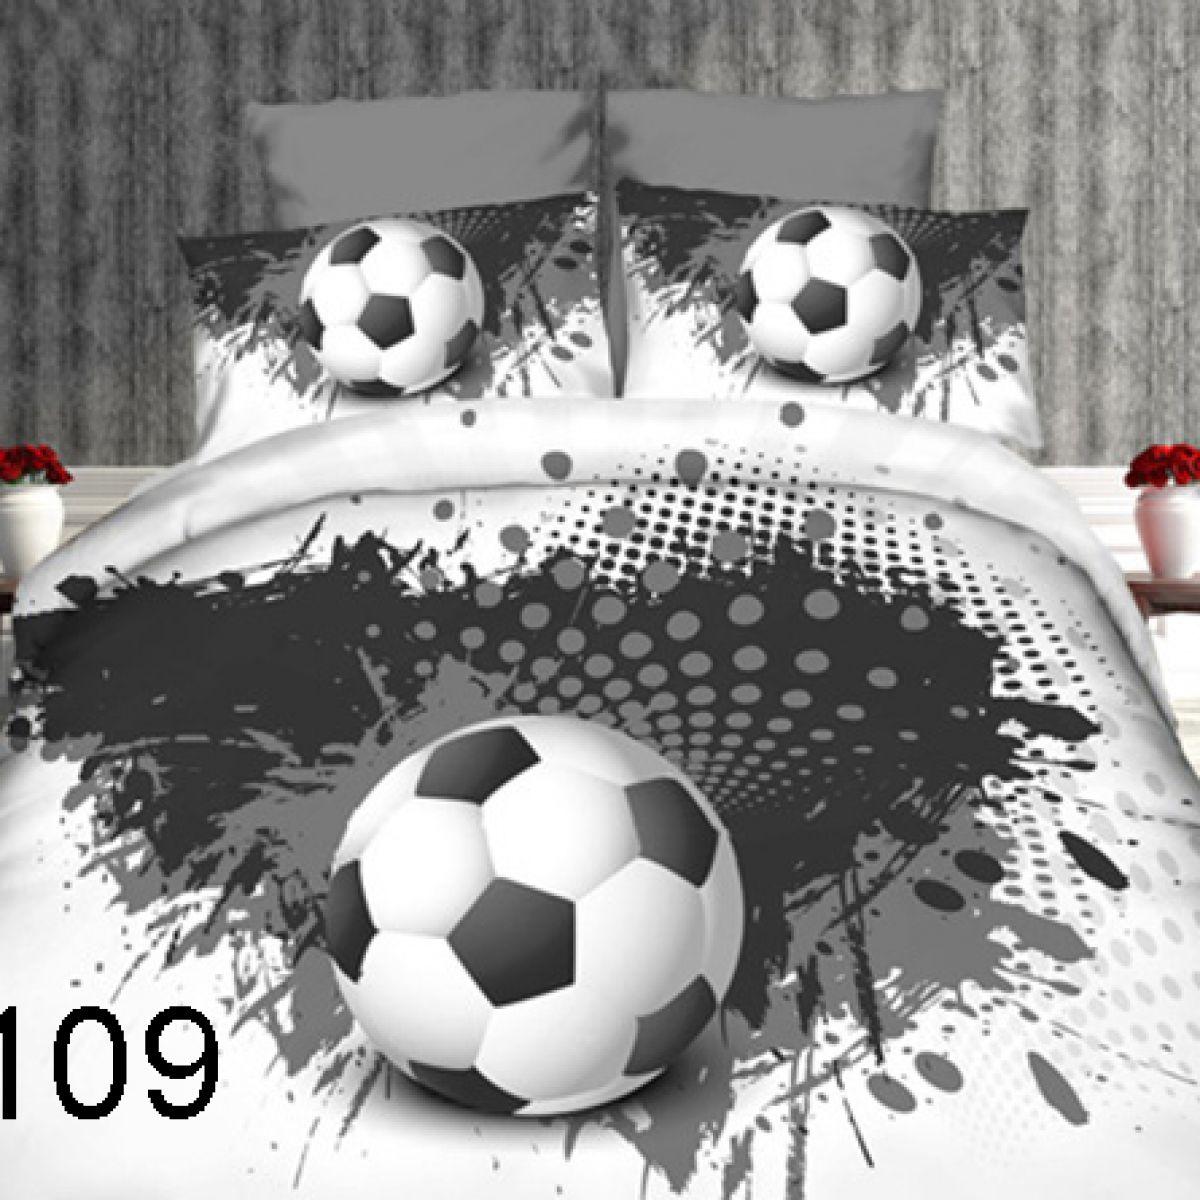 3D Beddings - Antonio - AML-109 - 160x200 cm - 4 pcs